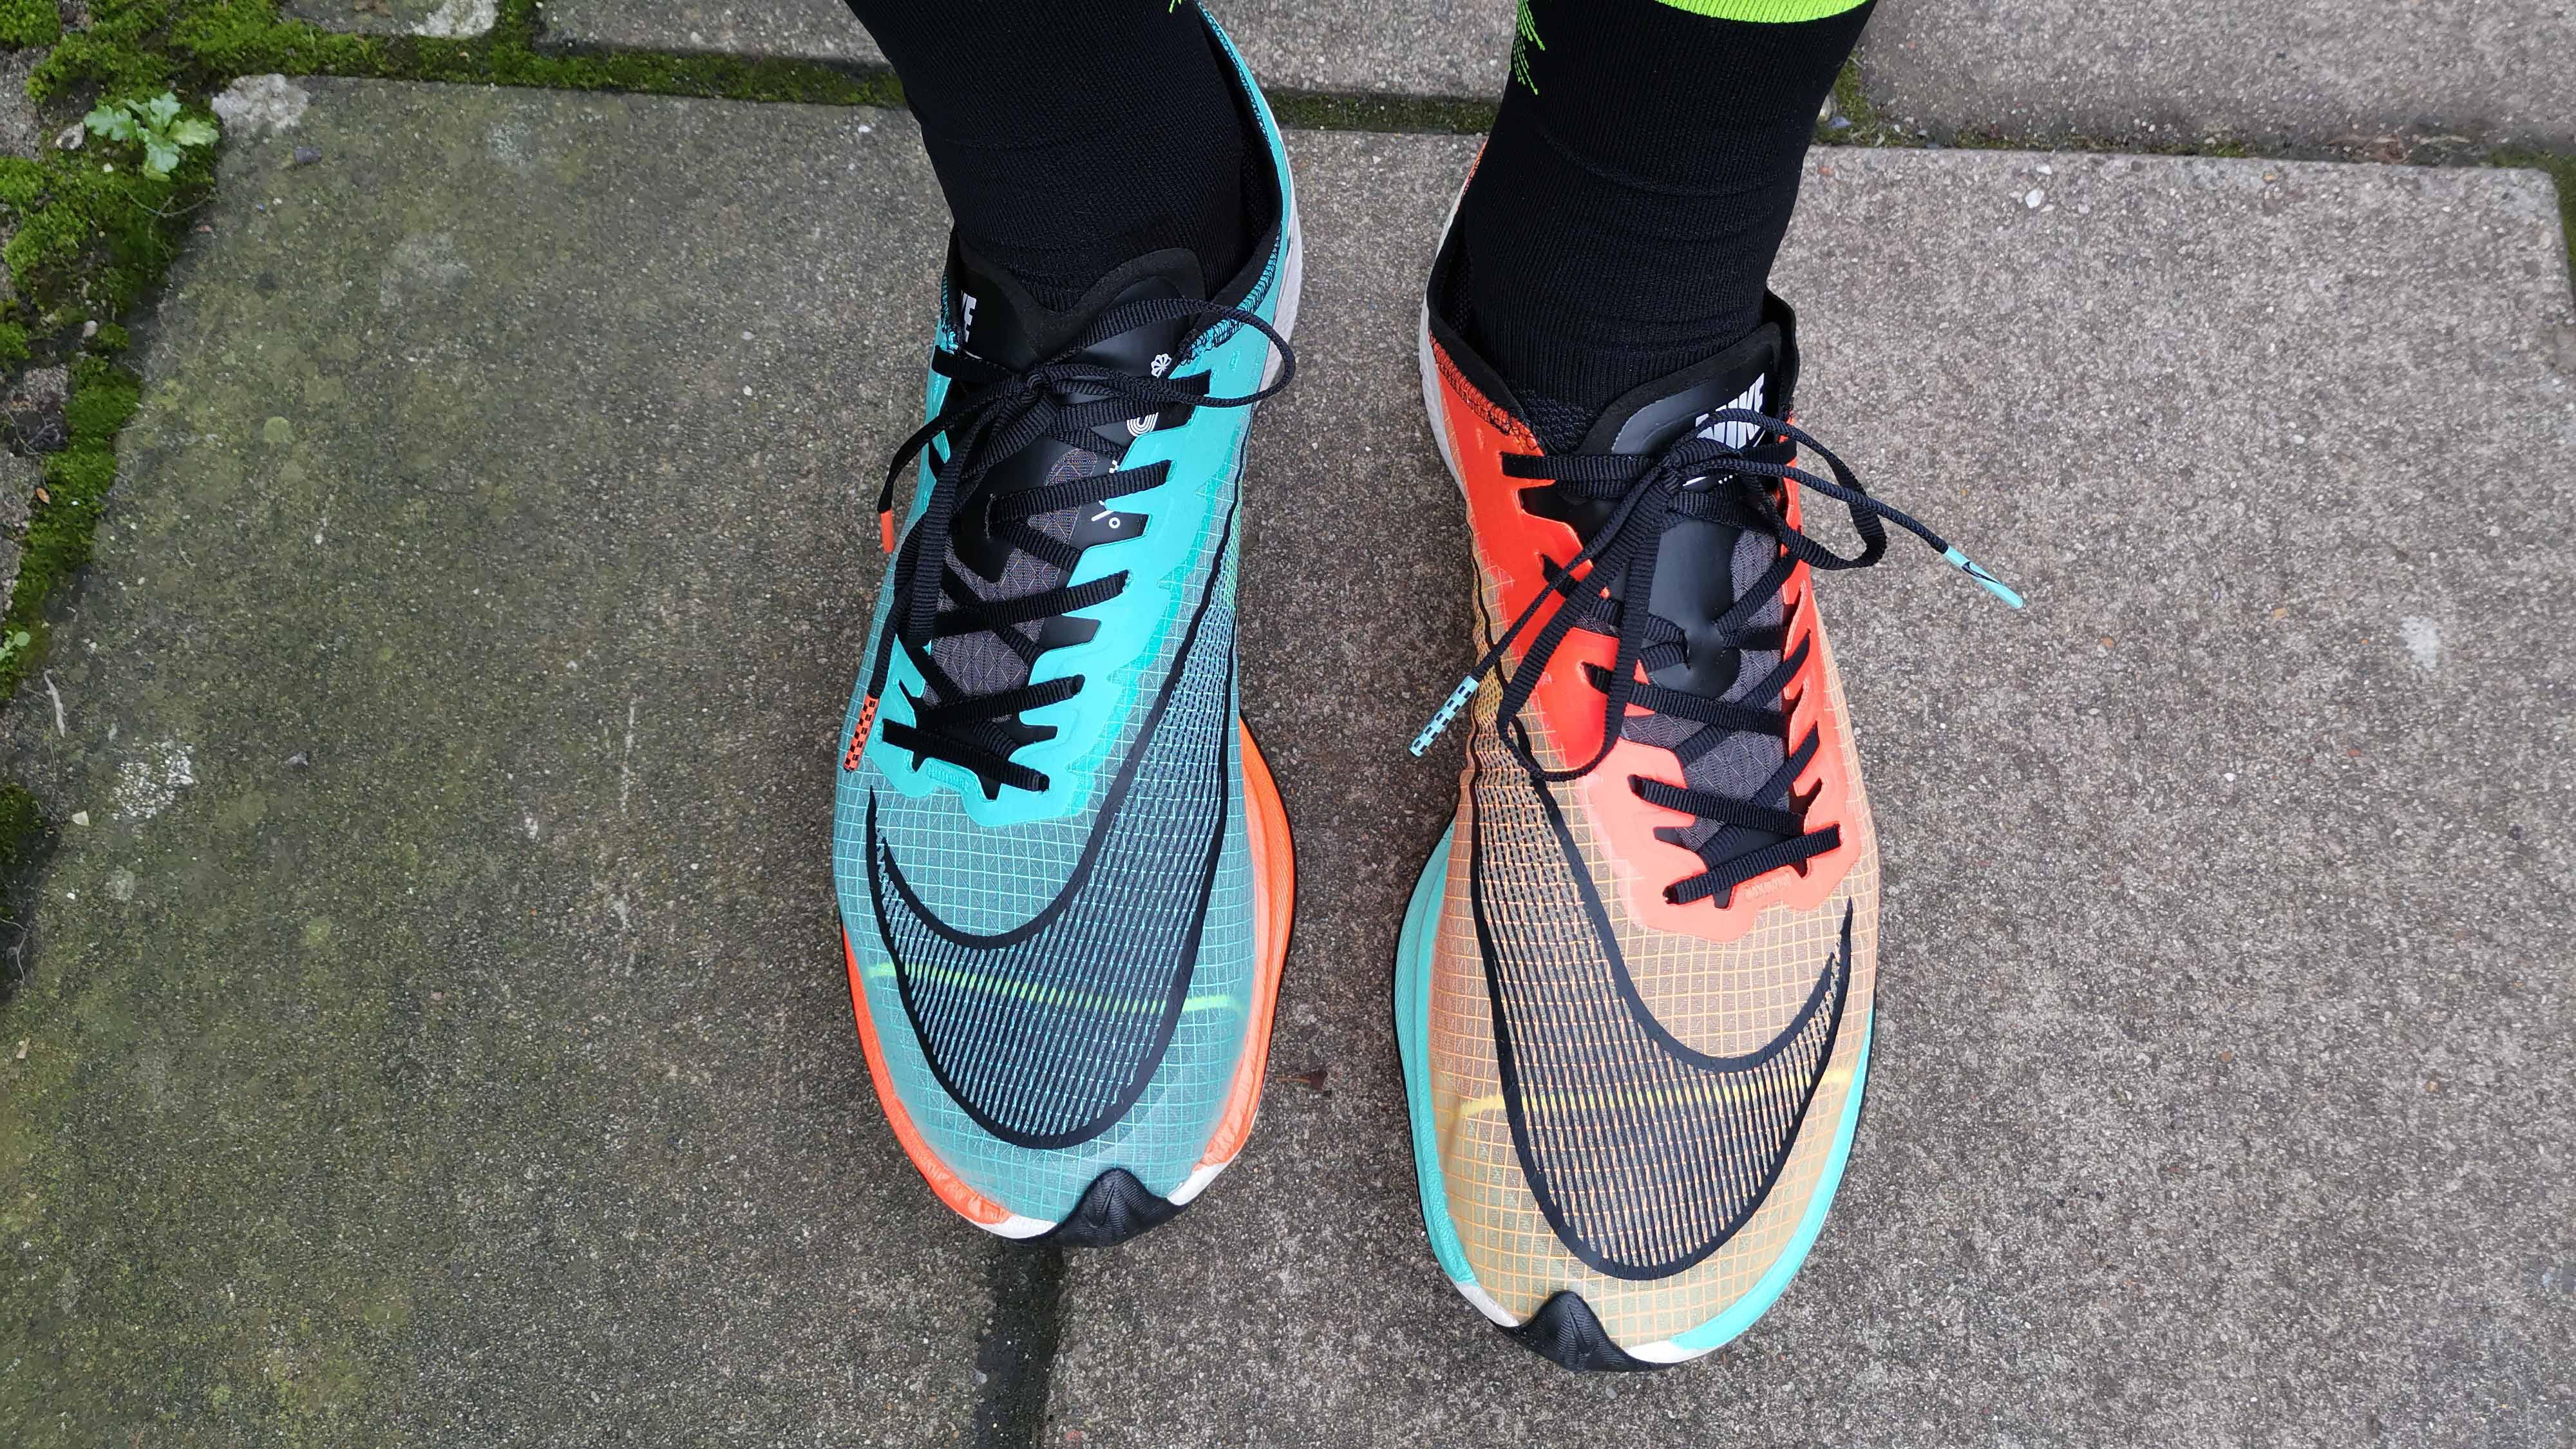 Nike Vaporfly Next% Running Shoes